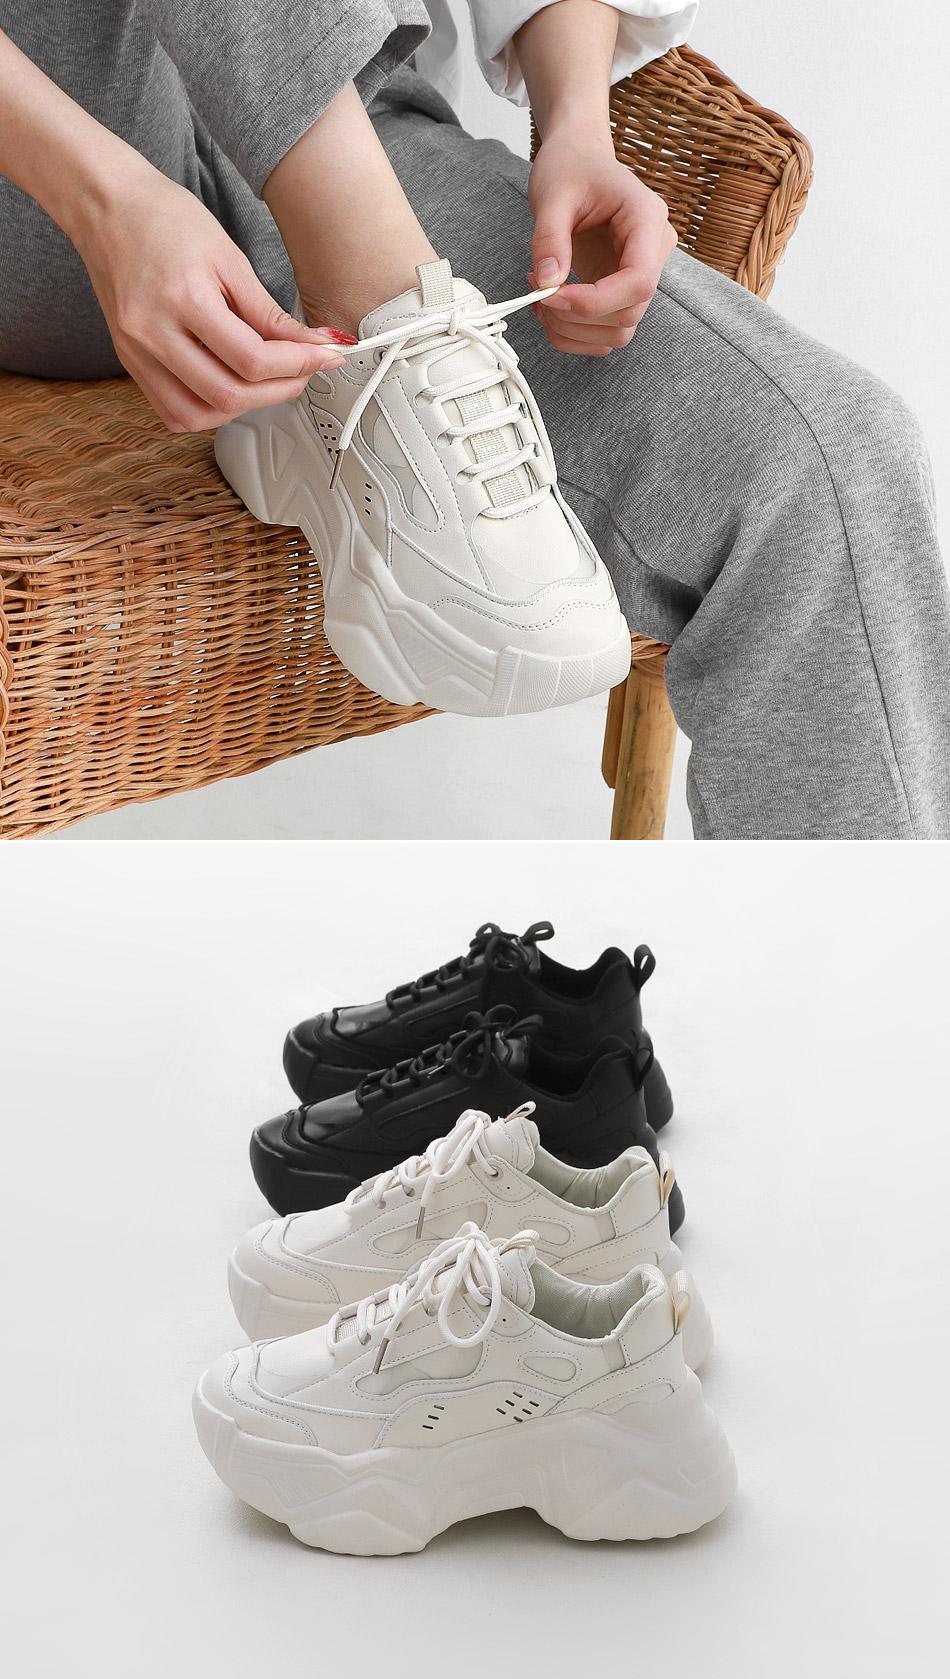 Isshu Ugly platform sneakers that look taller 10931